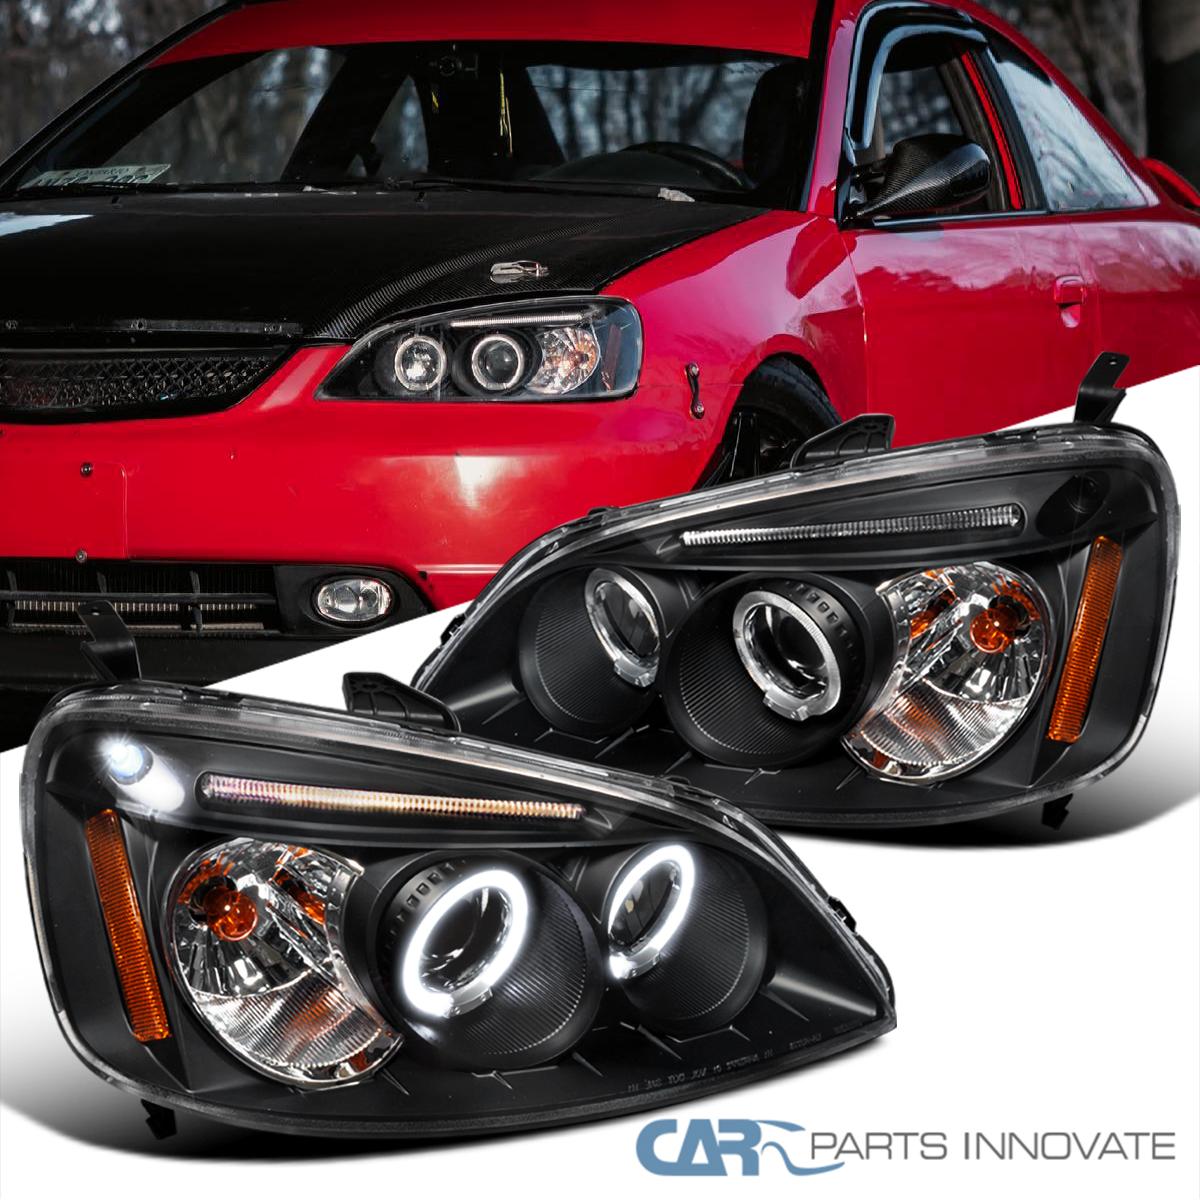 Larson Electronics 1015P9INIM4 -Chrome 100W Halogen Driver Side with Install kit 6 inch 2003 Honda Civic Coupe Post Mount Spotlight